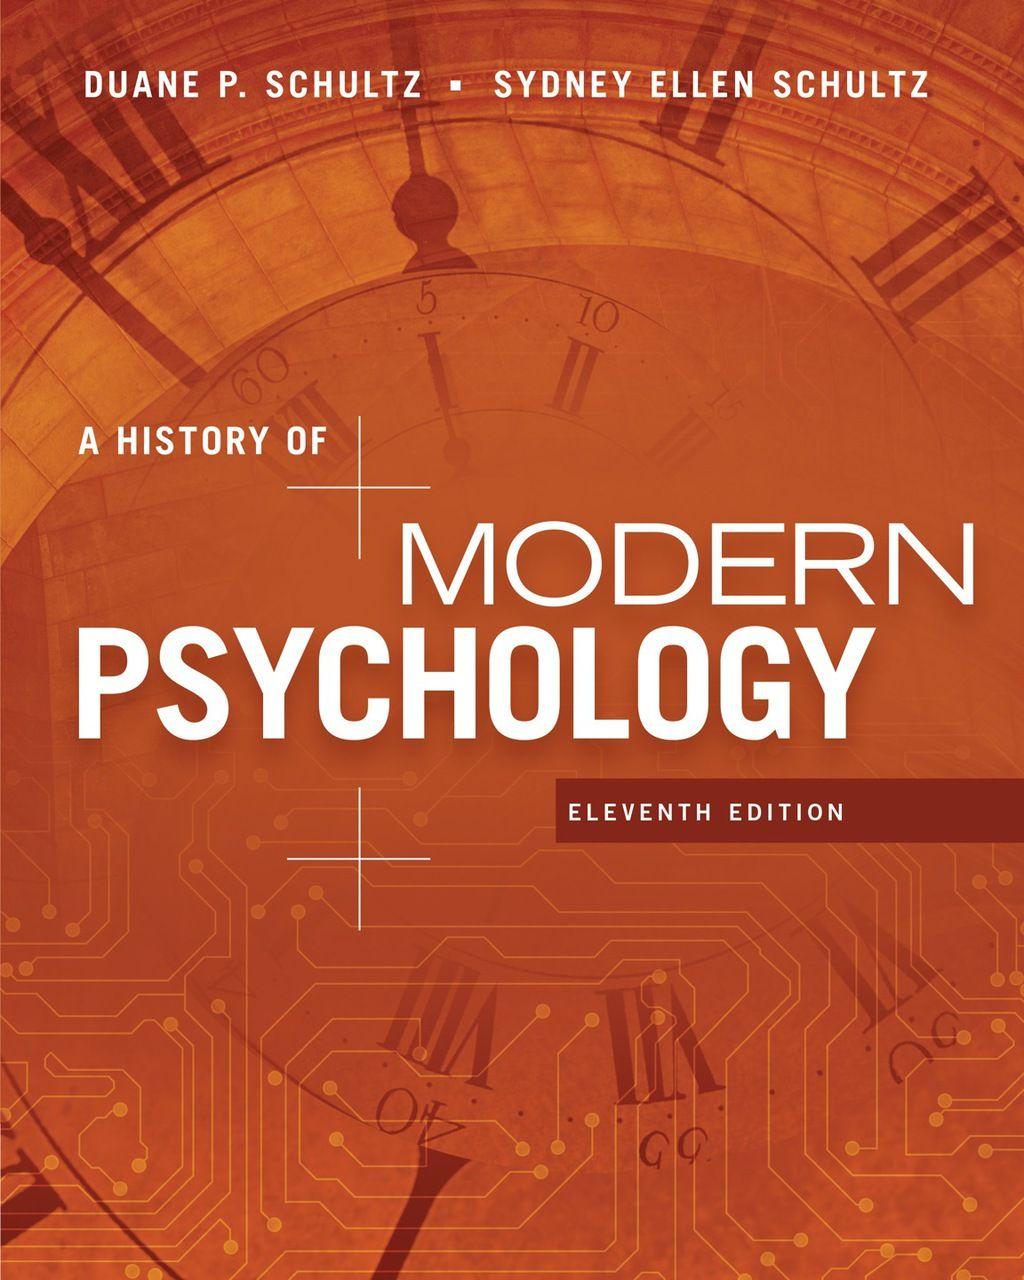 A History of Modern Psychology (eBook Rental) History of